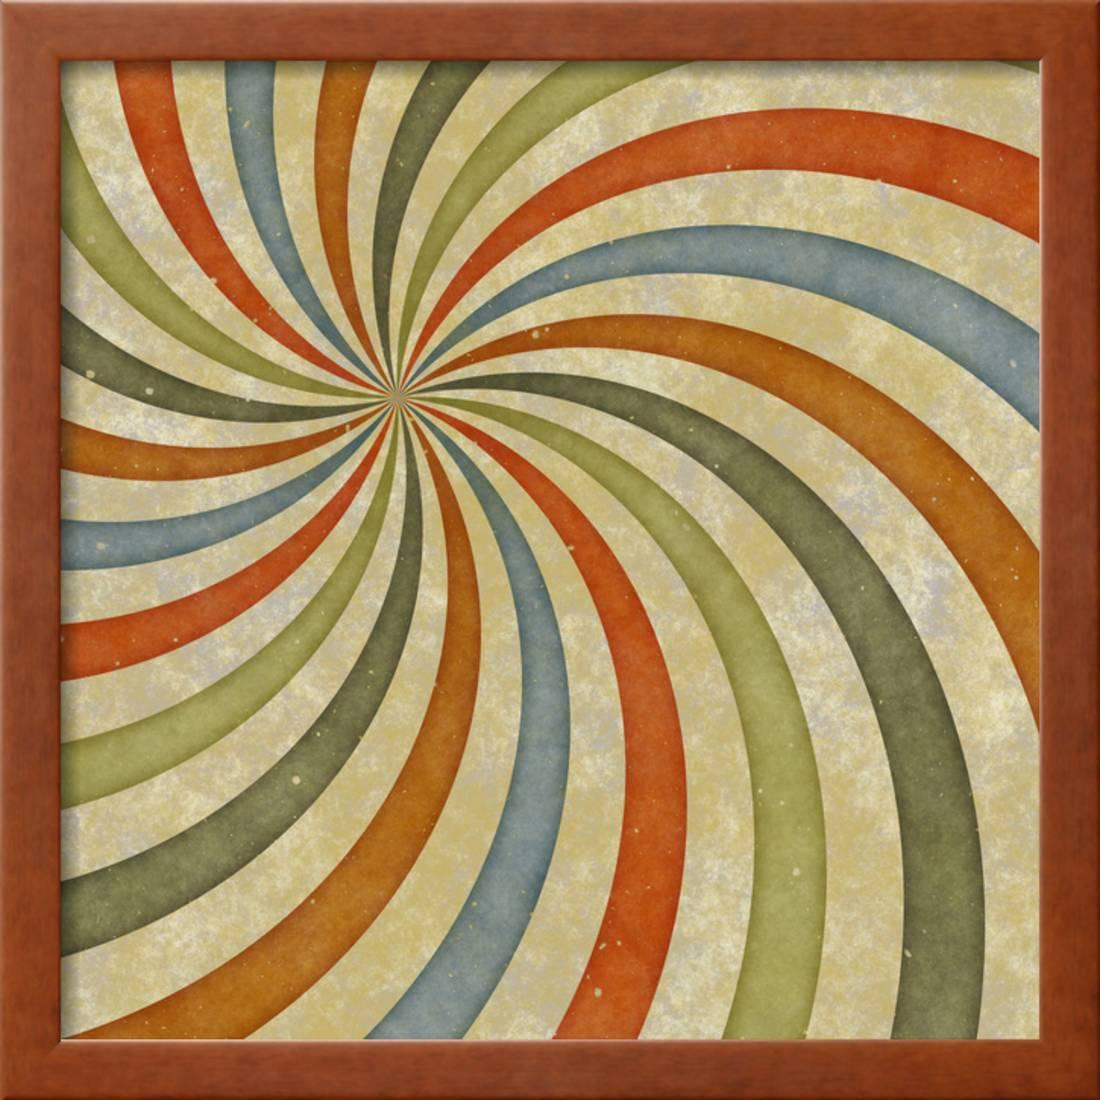 Sixties or Early Seventies Retro Grungy Sunburst Swirl Framed Print ...